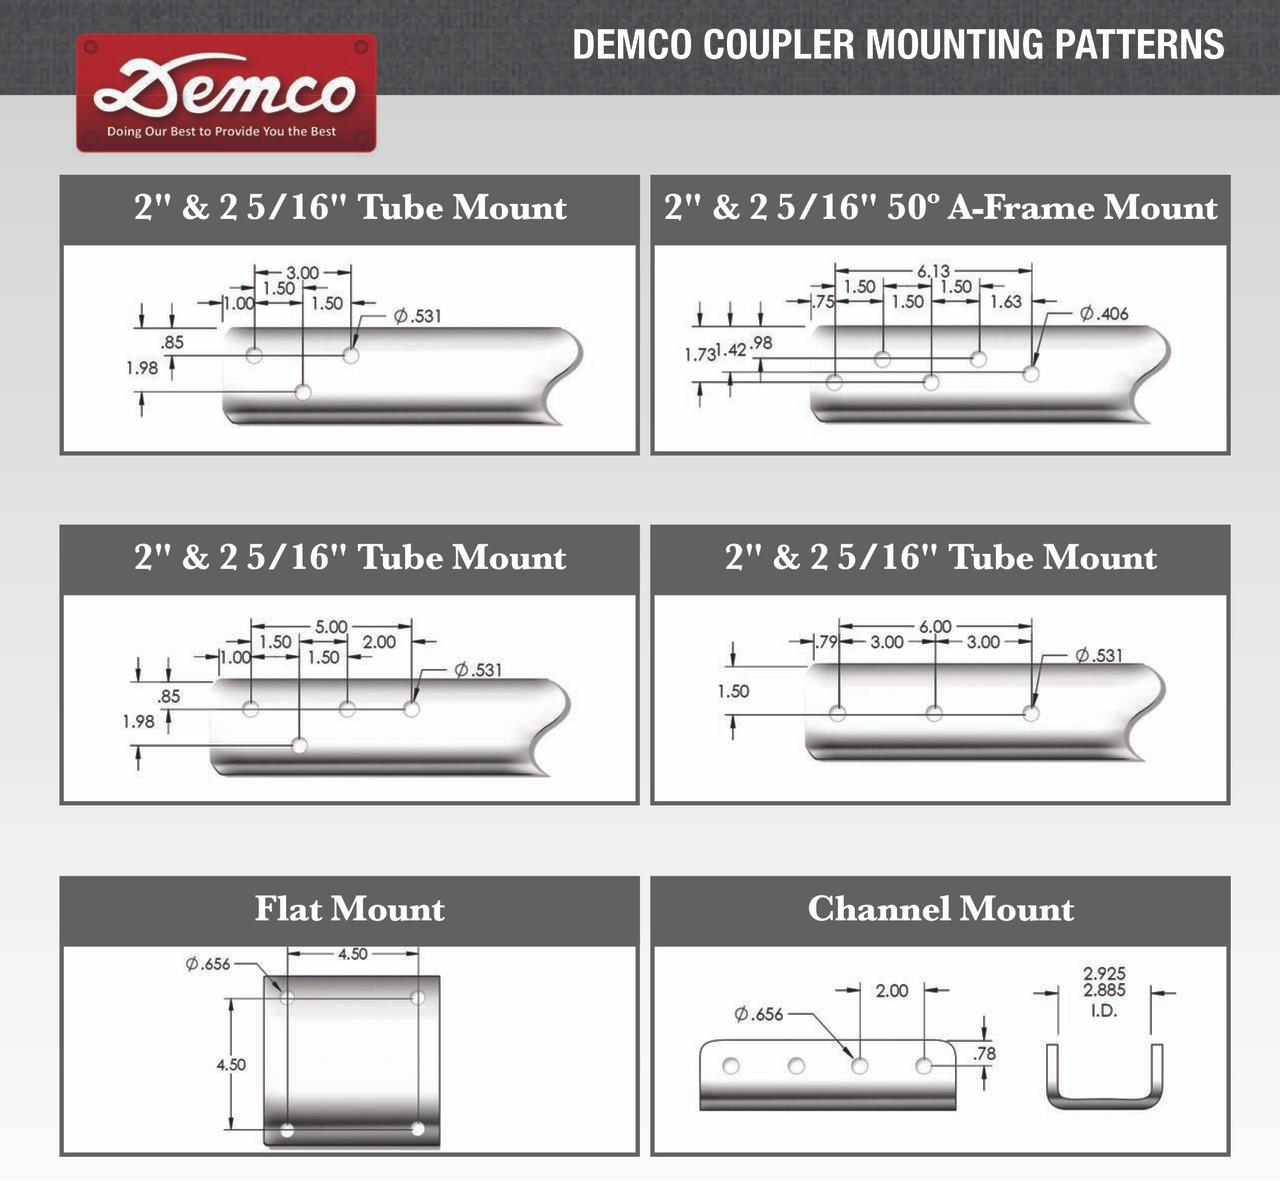 "15923-97 --- Demco Cast Plate-Mount 2-5/16"" Coupler - 21,000 lb Capacity - Primed"